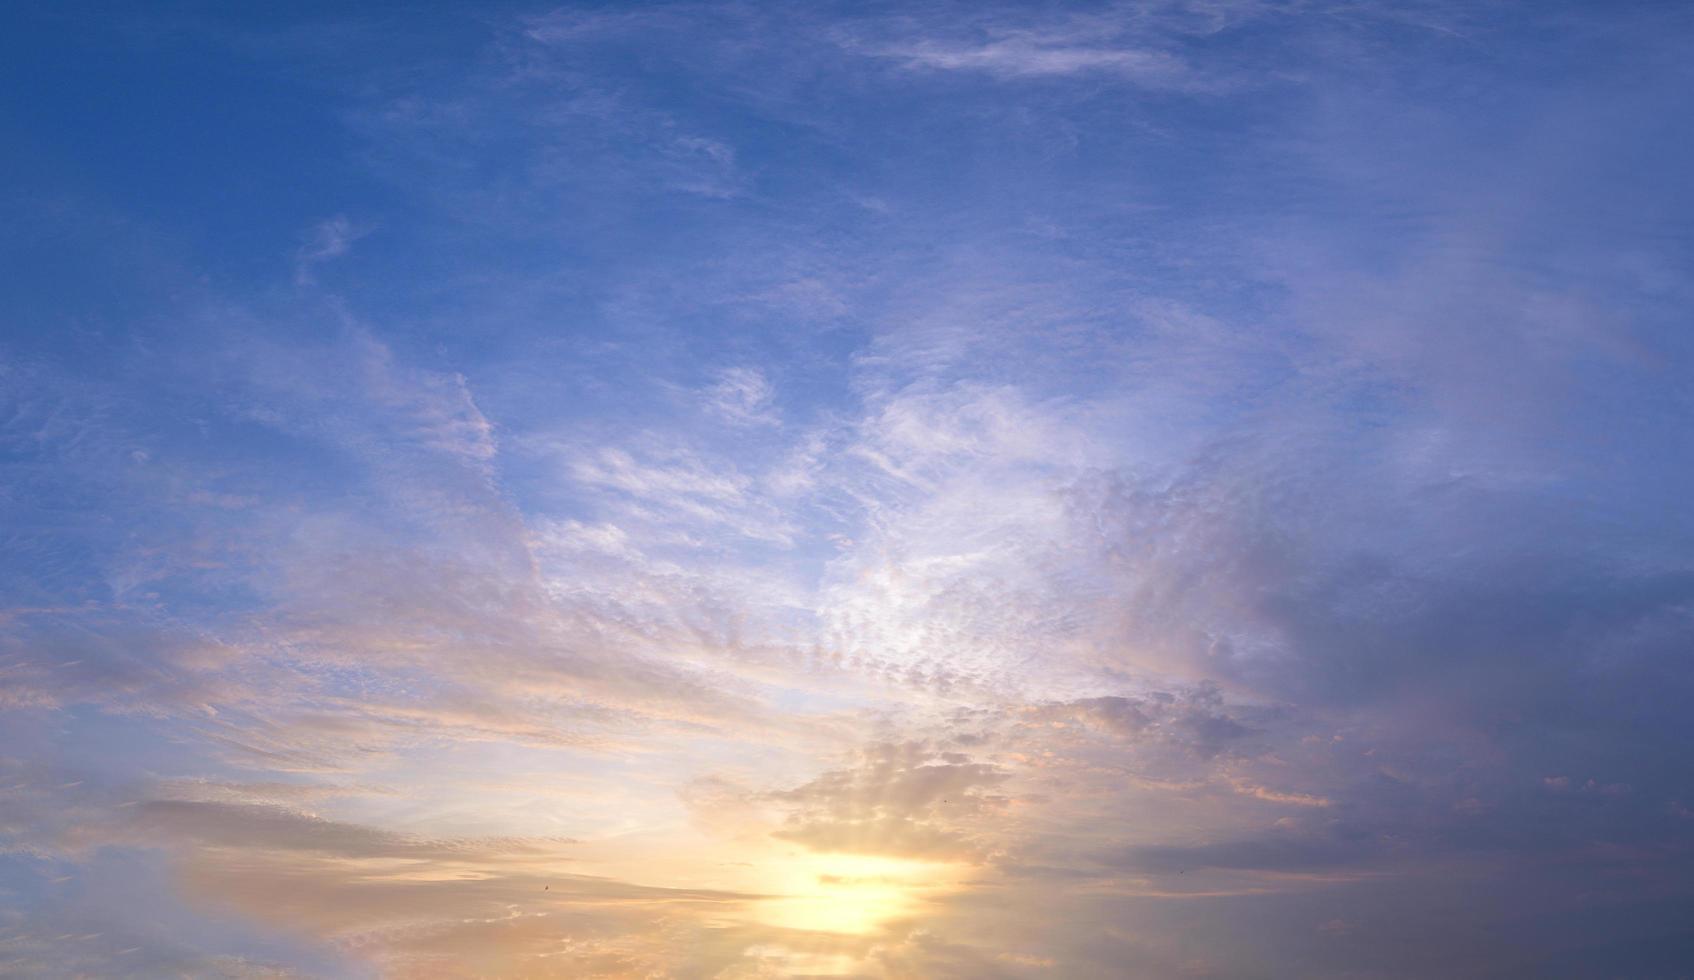 hemel en zon bij zonsondergang foto